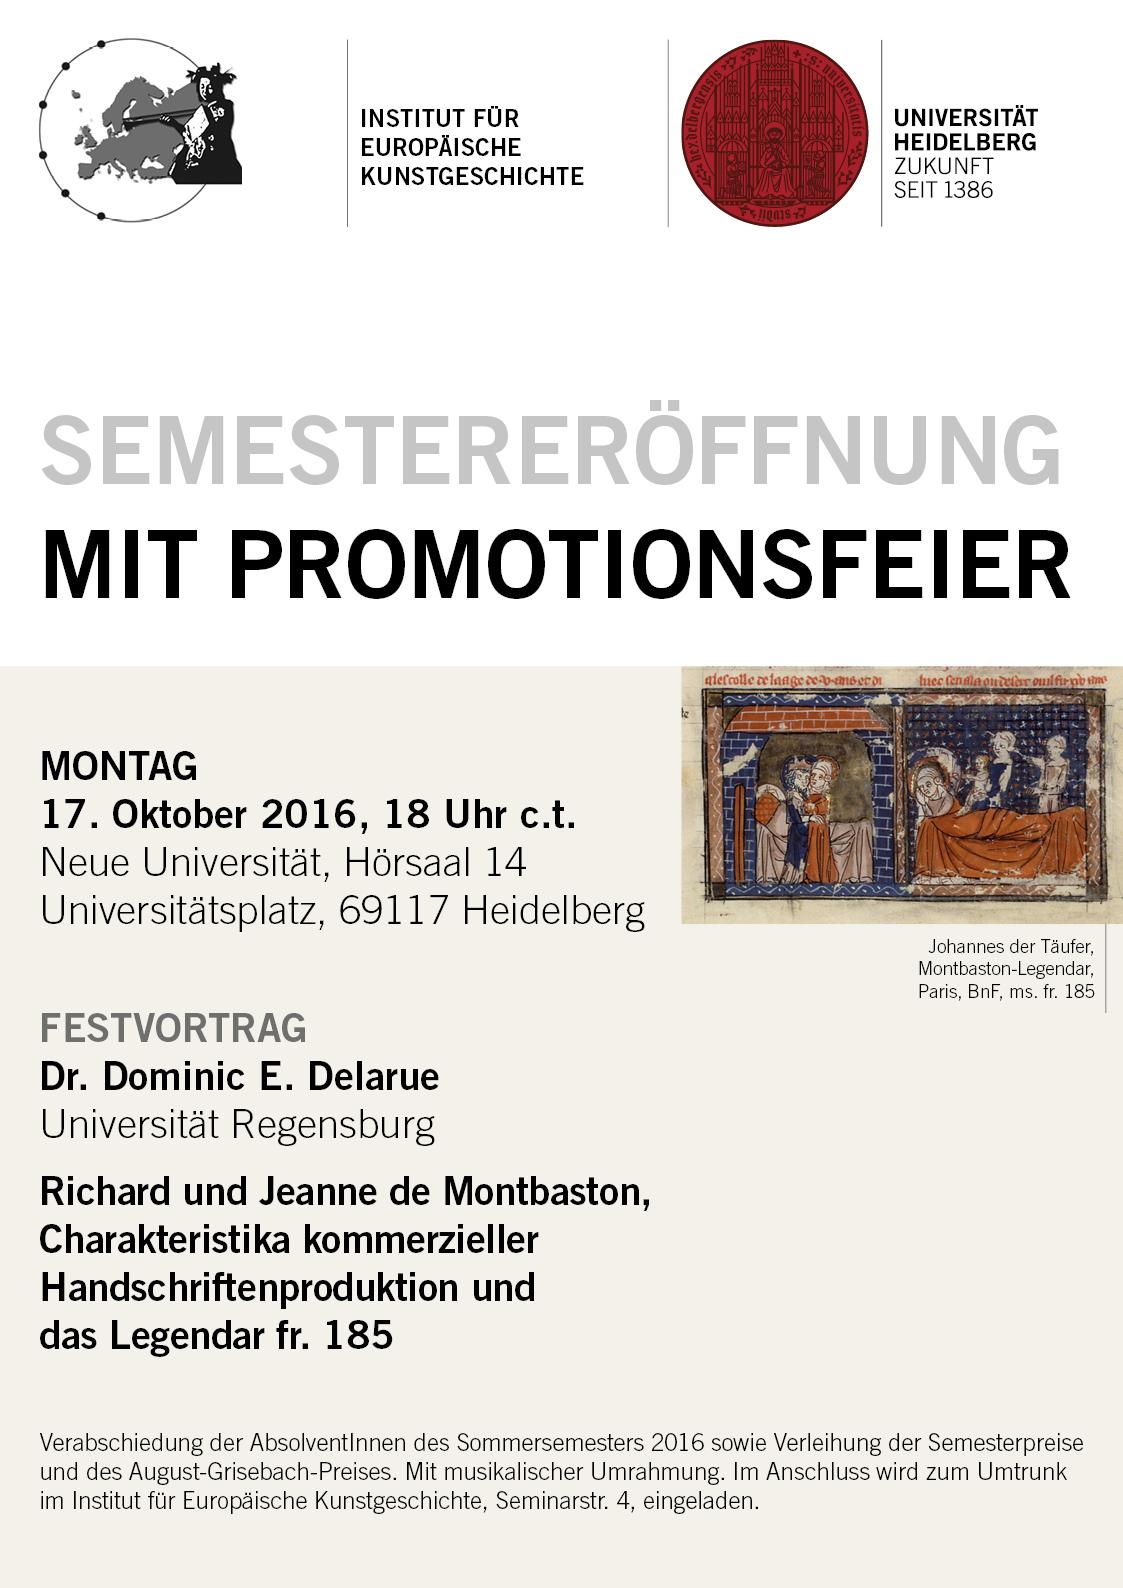 Mannheim exam dates